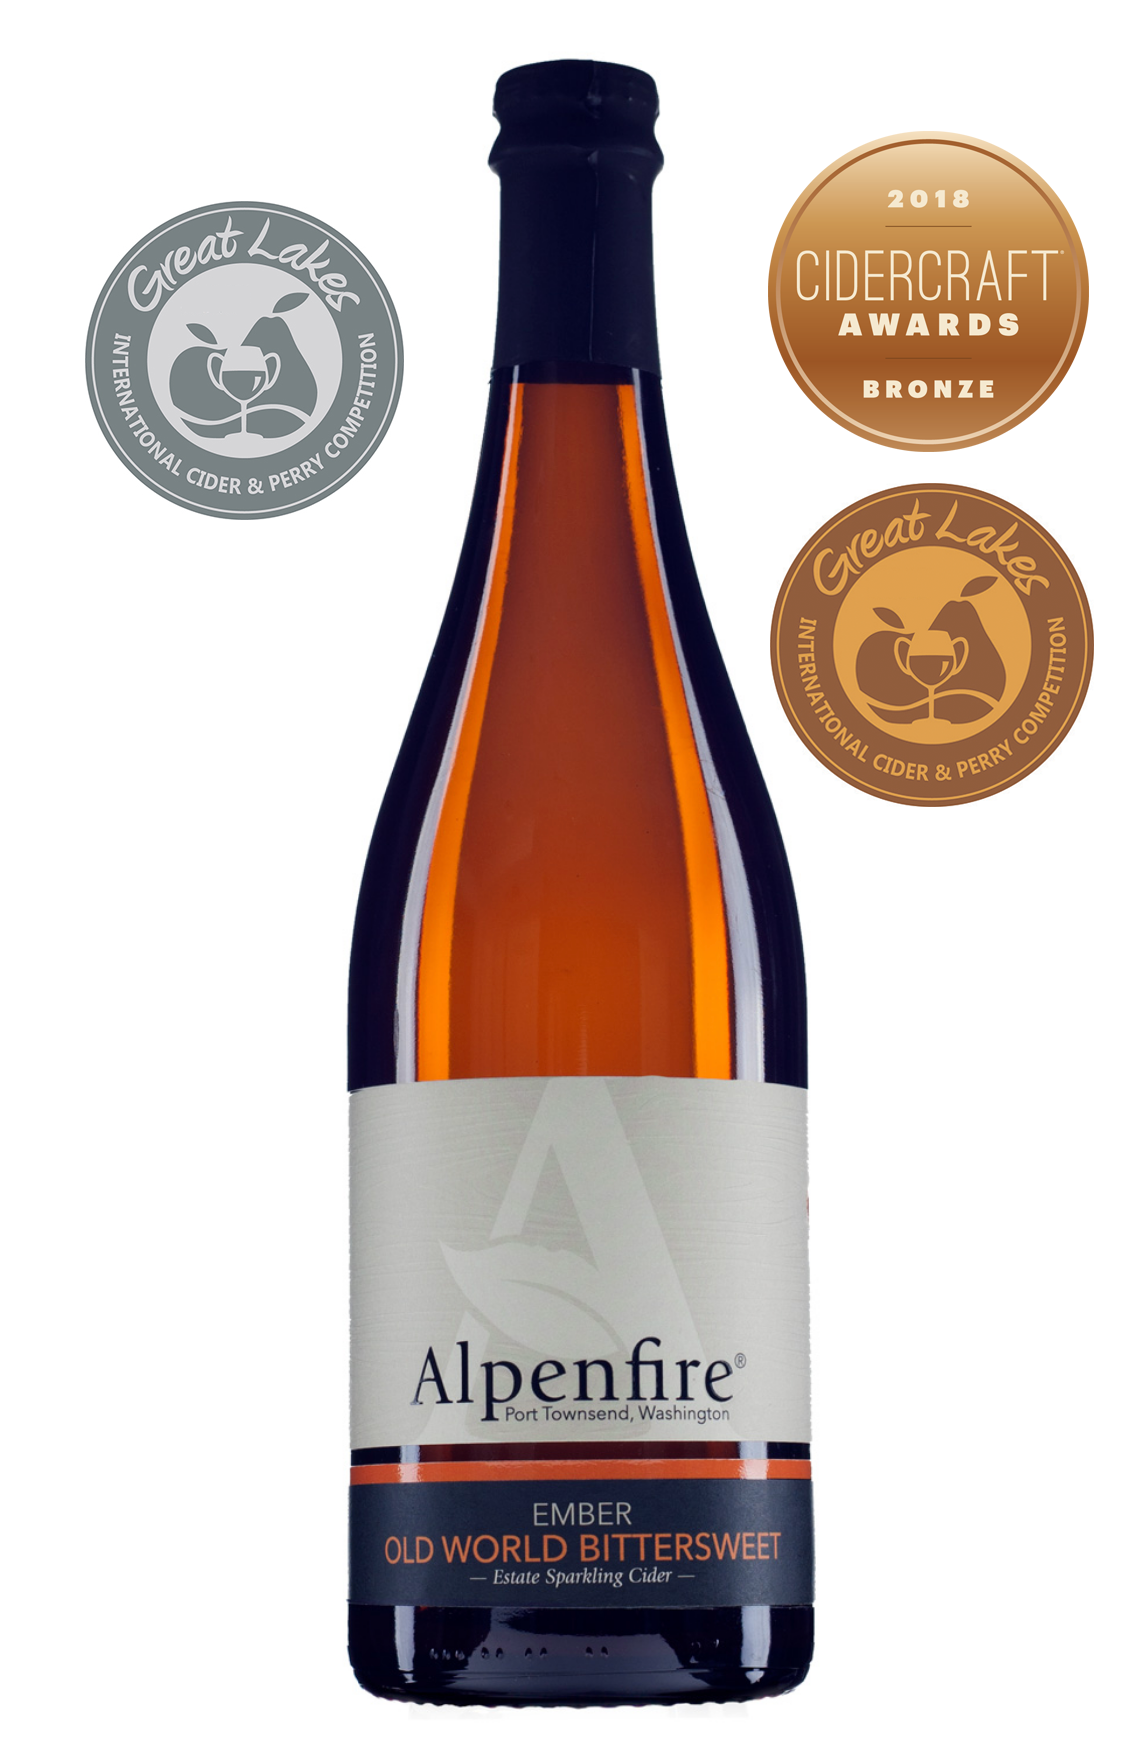 Alpenfire-Old-World-Bittersweet-Ember-glintcap-cidercraft-awards.png